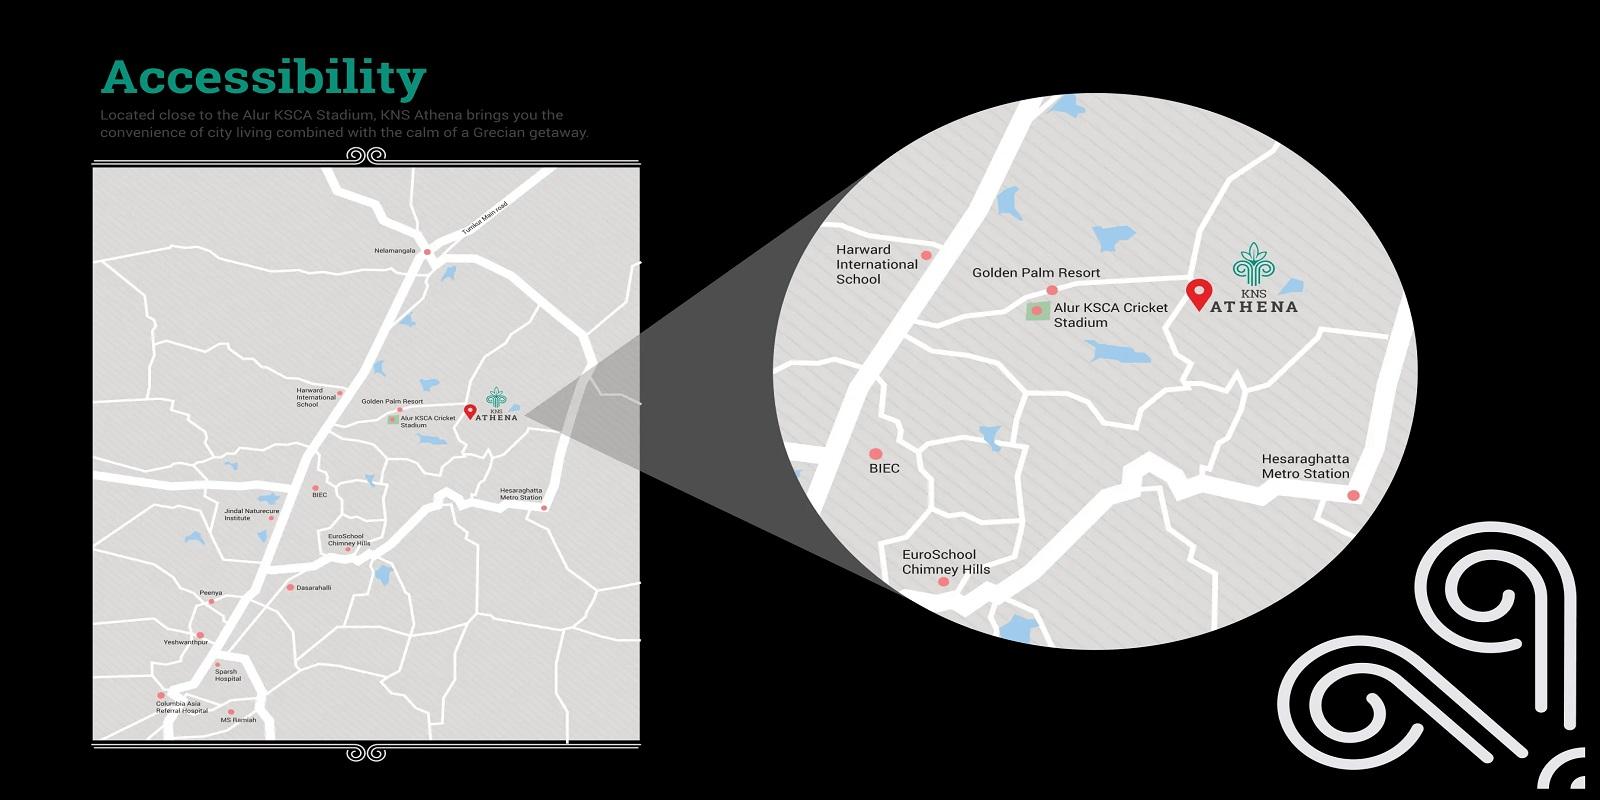 neelanchanl kns athena project location image1